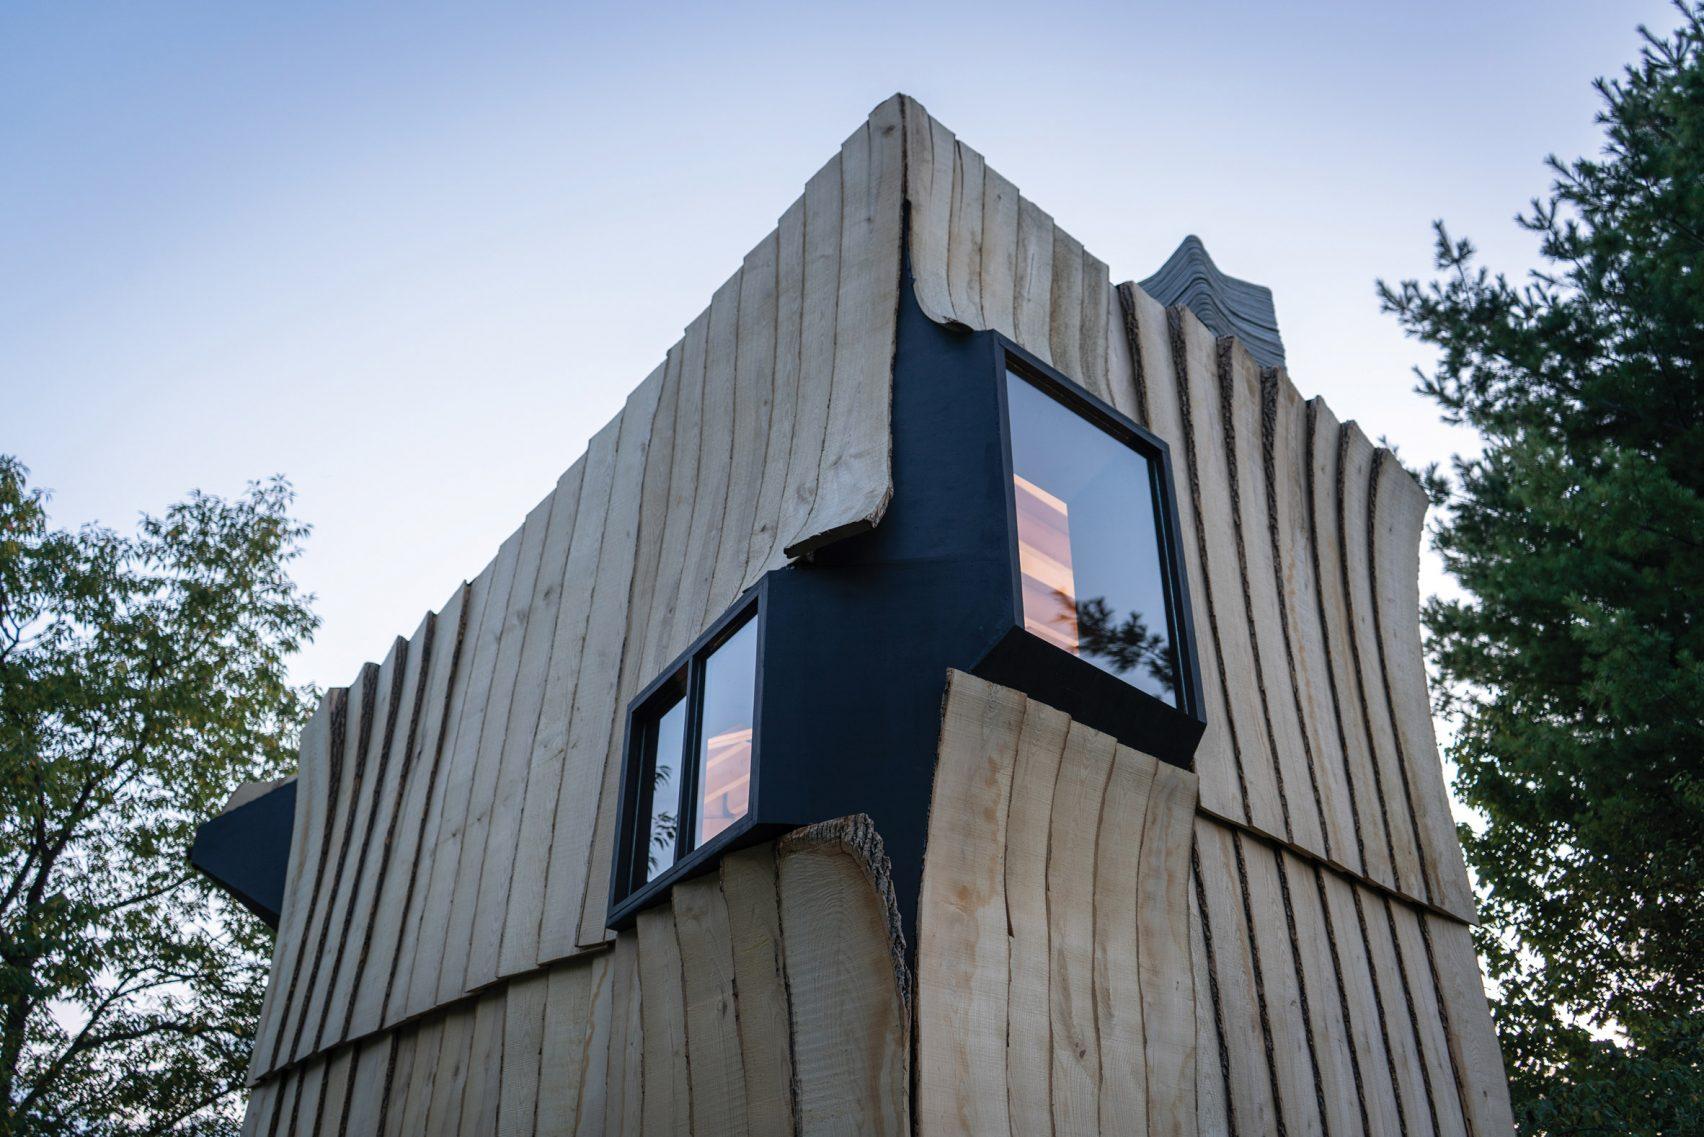 Kabin Unik dengan Teknologi Cetak 3D